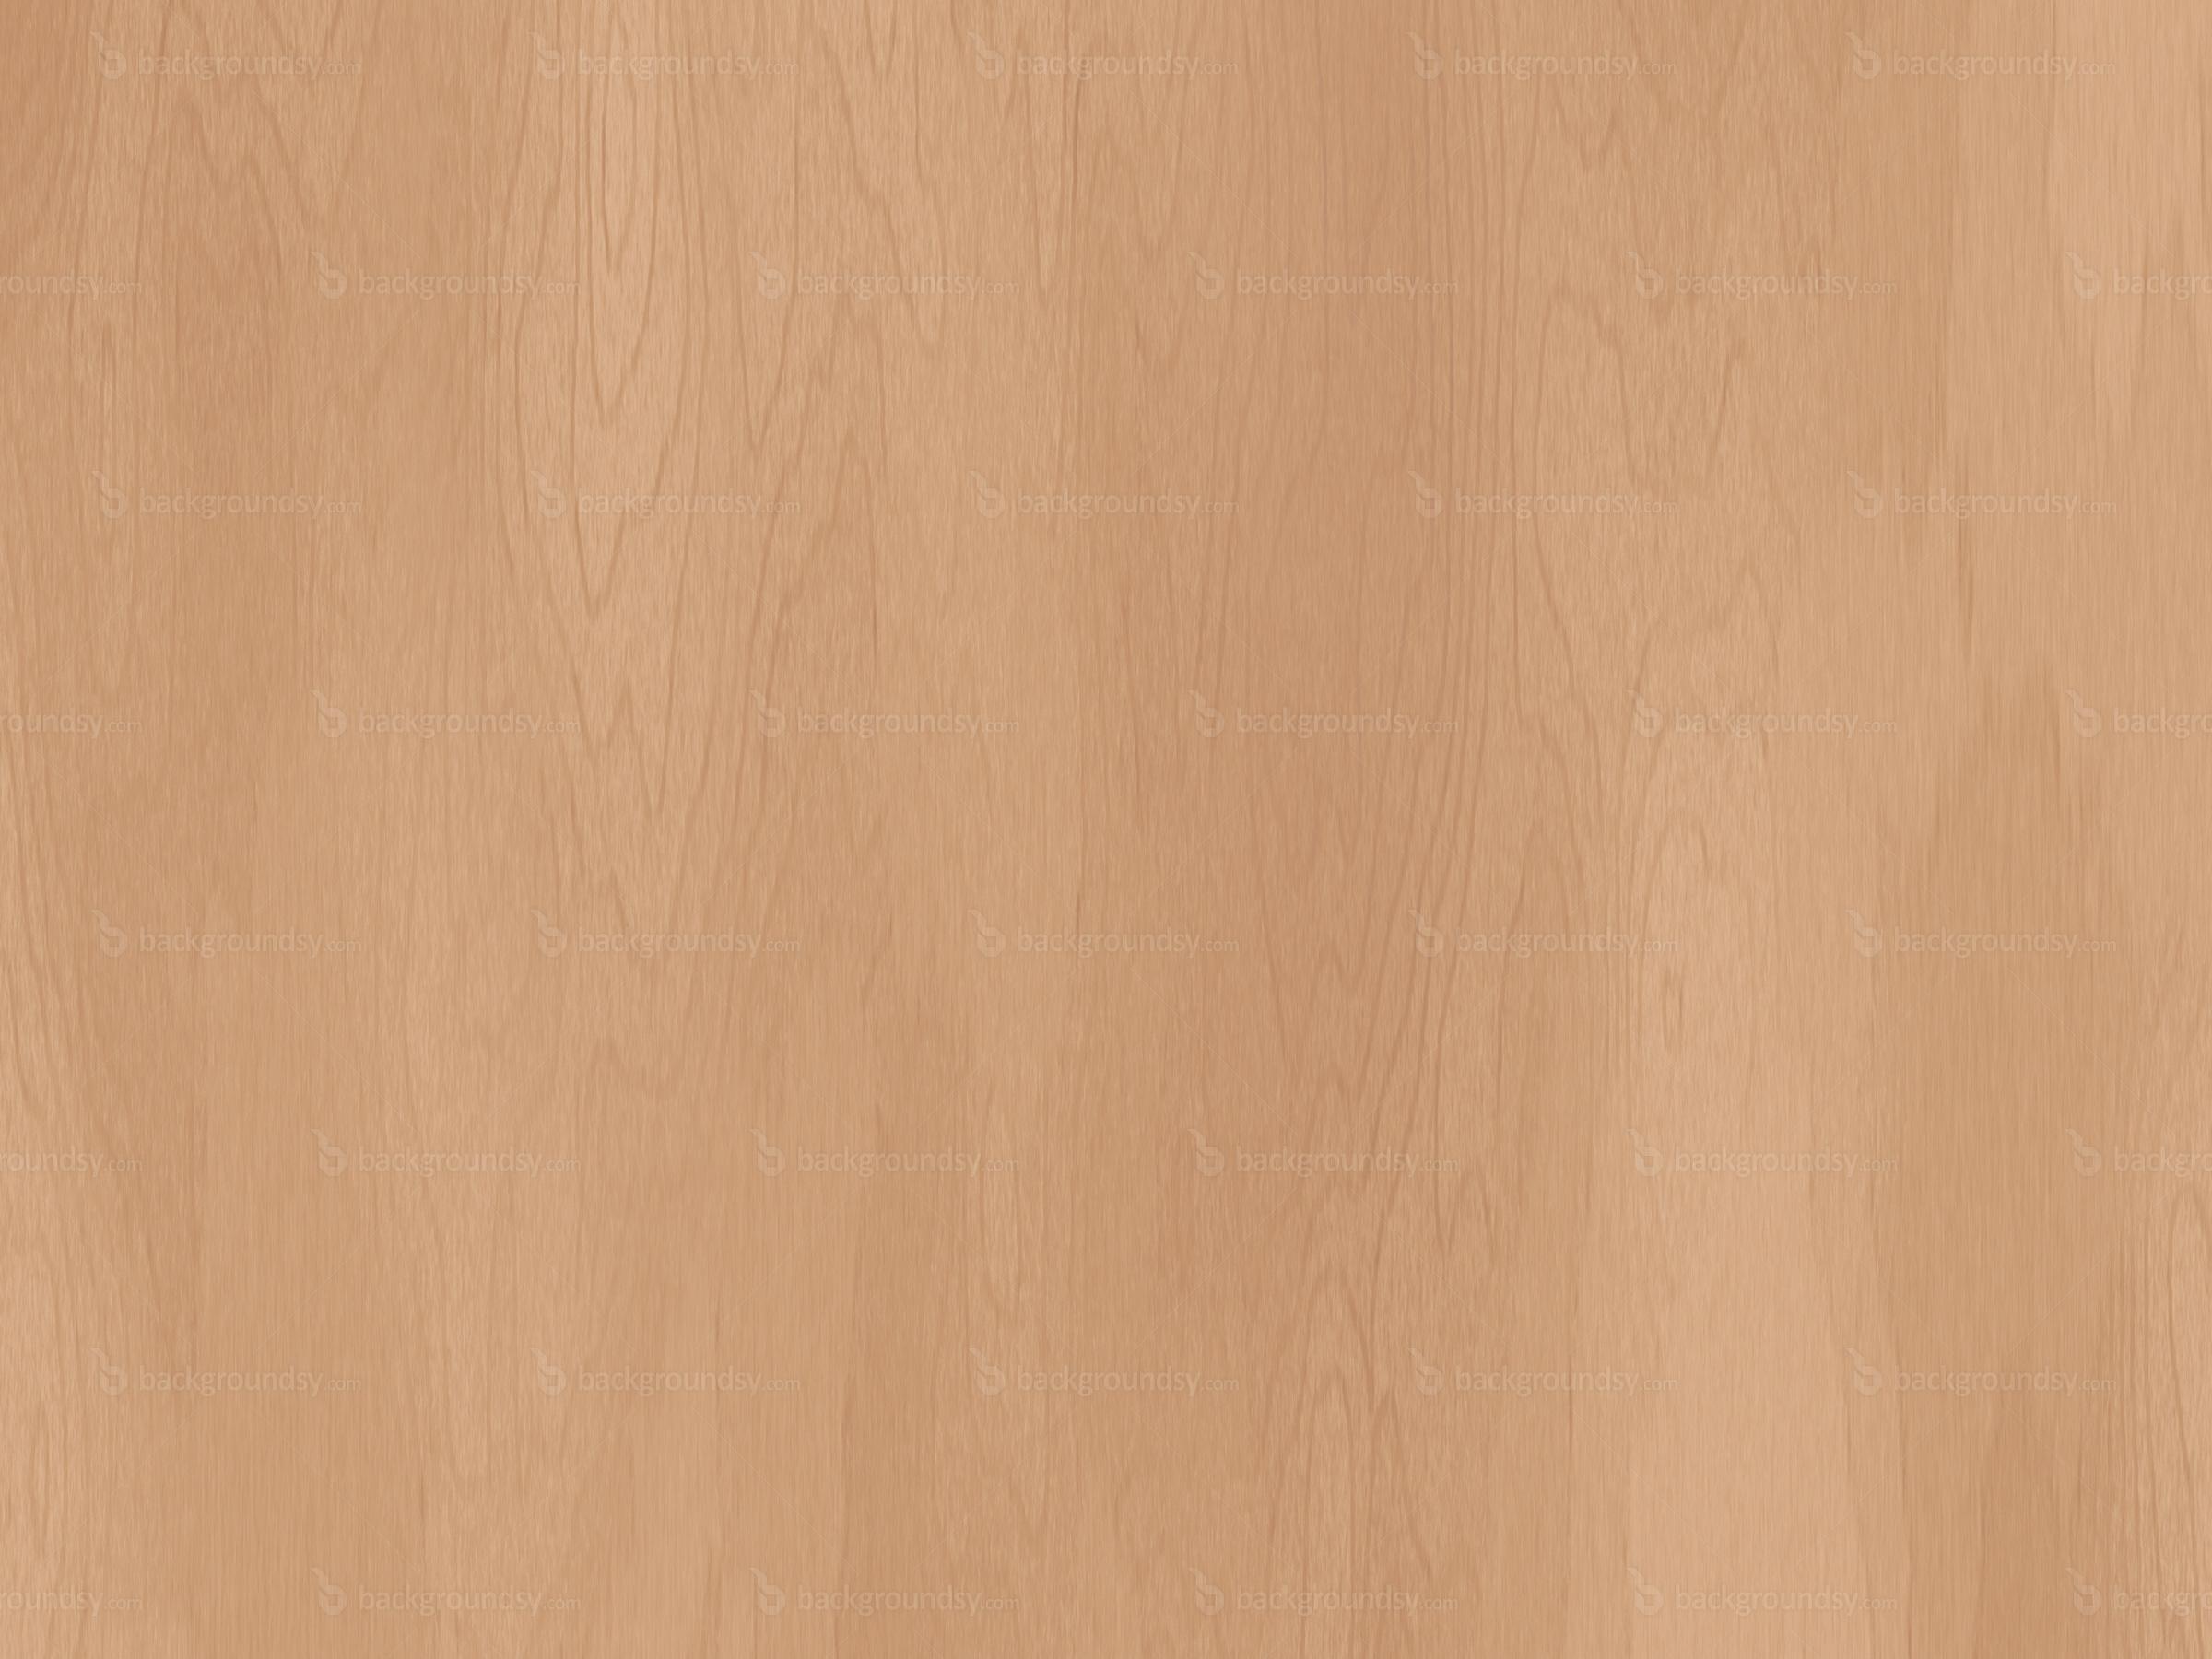 Light wooden texture | Backgroundsy.com